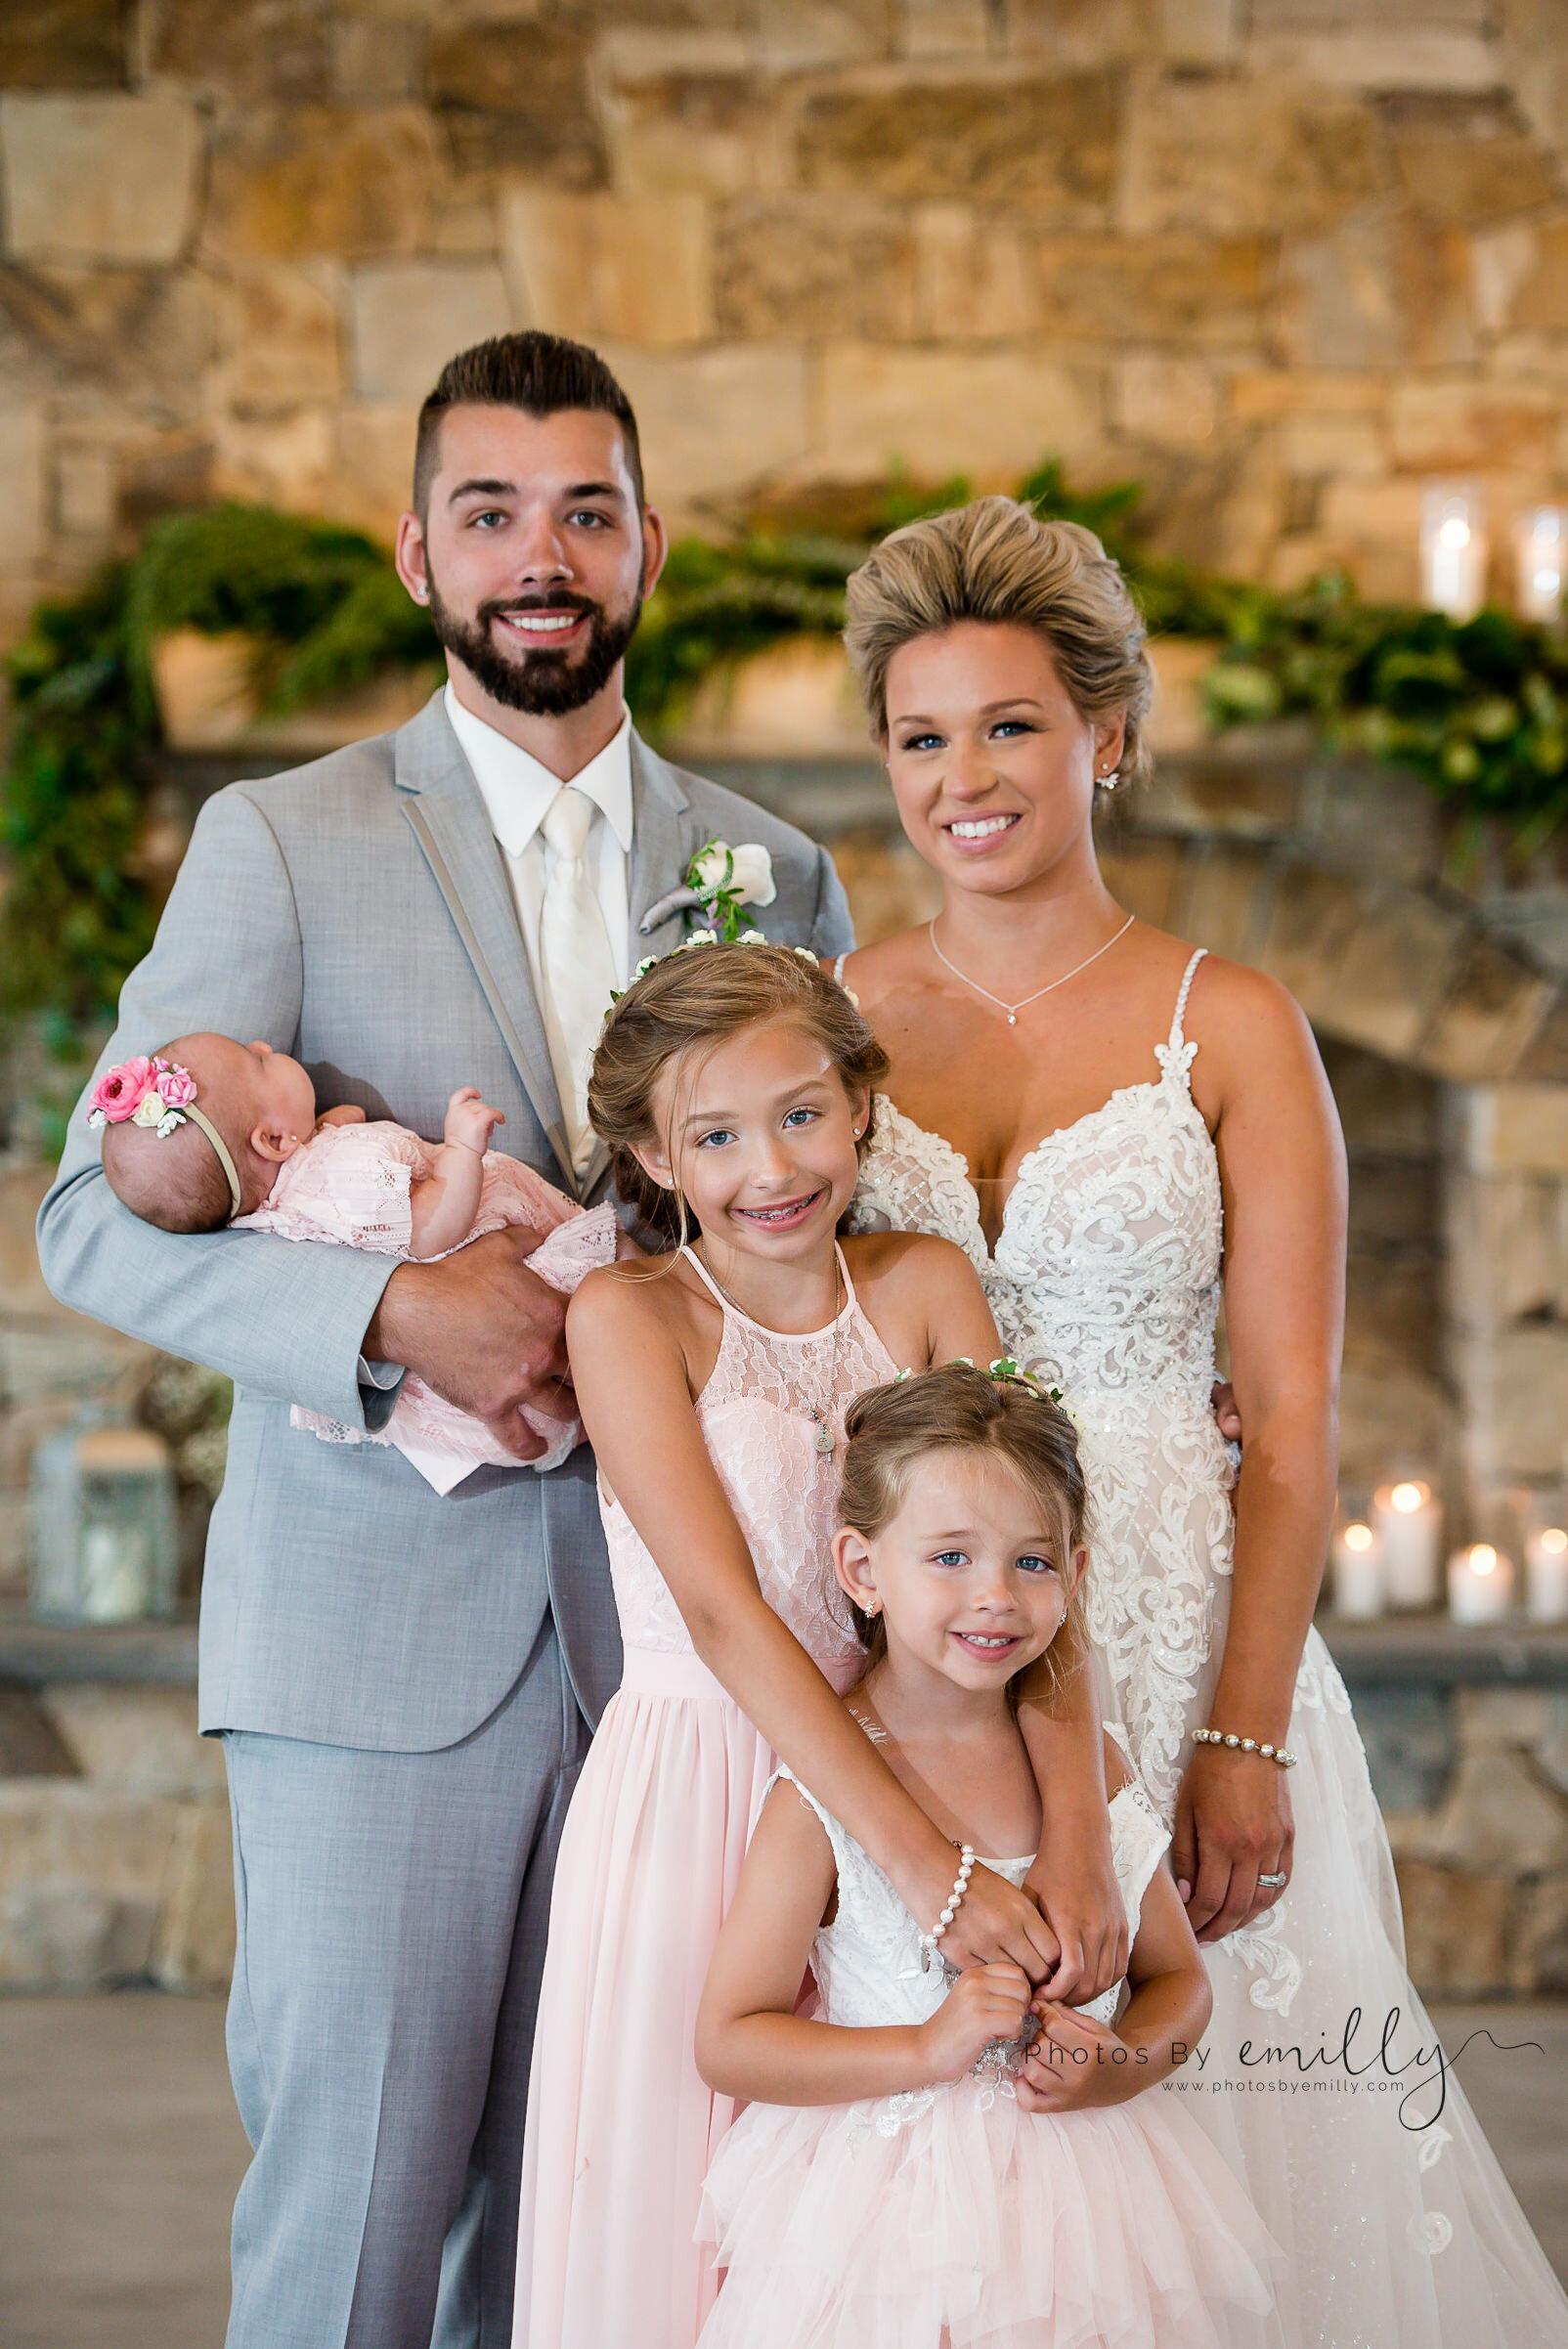 Photos by Emilly - LONG Wedding (17).jpg